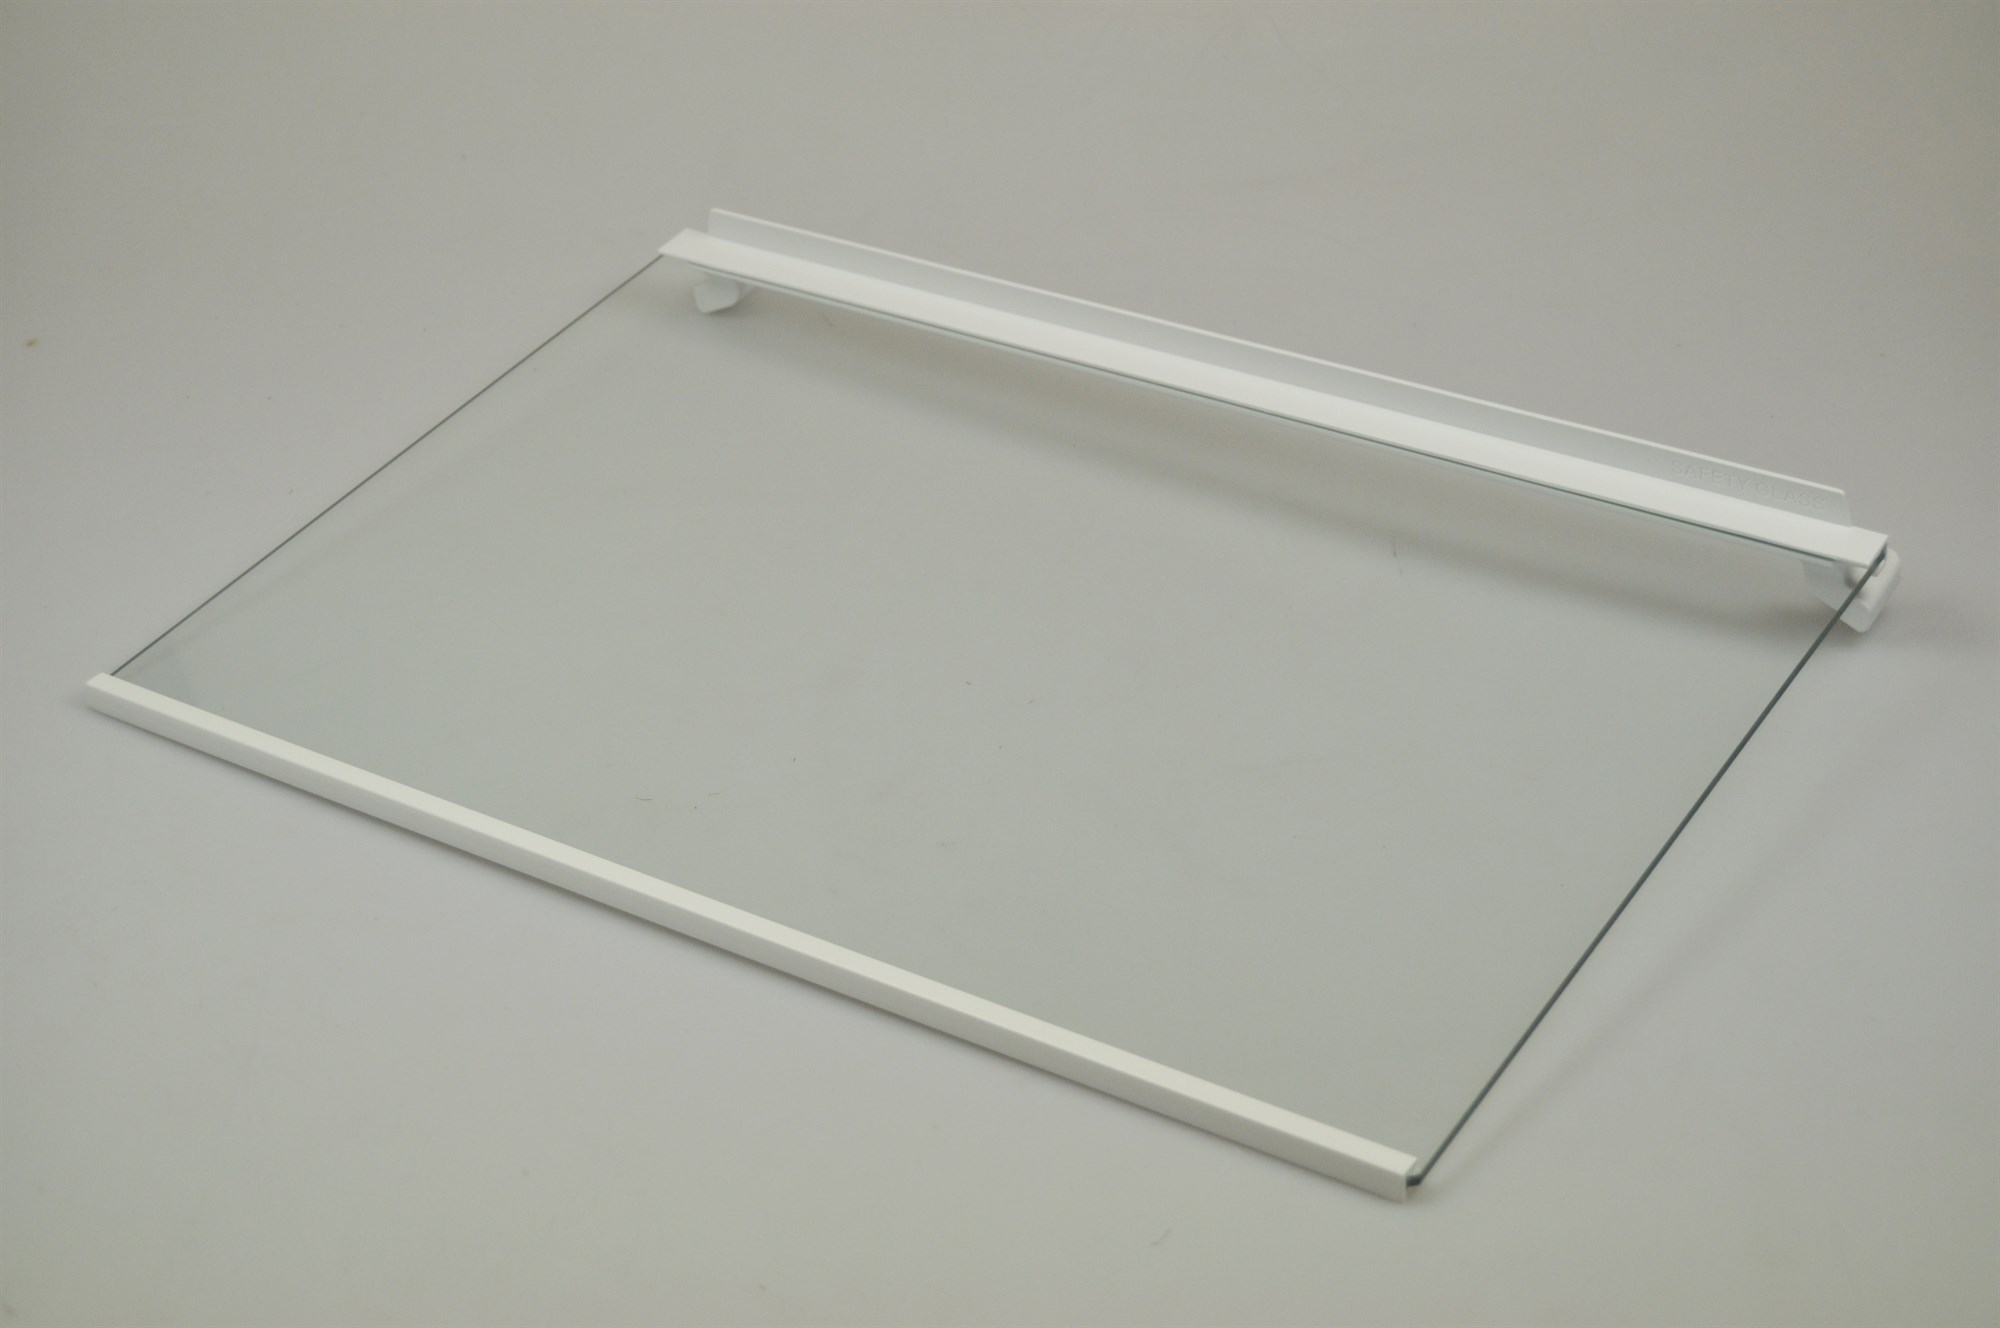 Glass Shelf Siemens Fridge Amp Freezer 460mm X 335mm Not